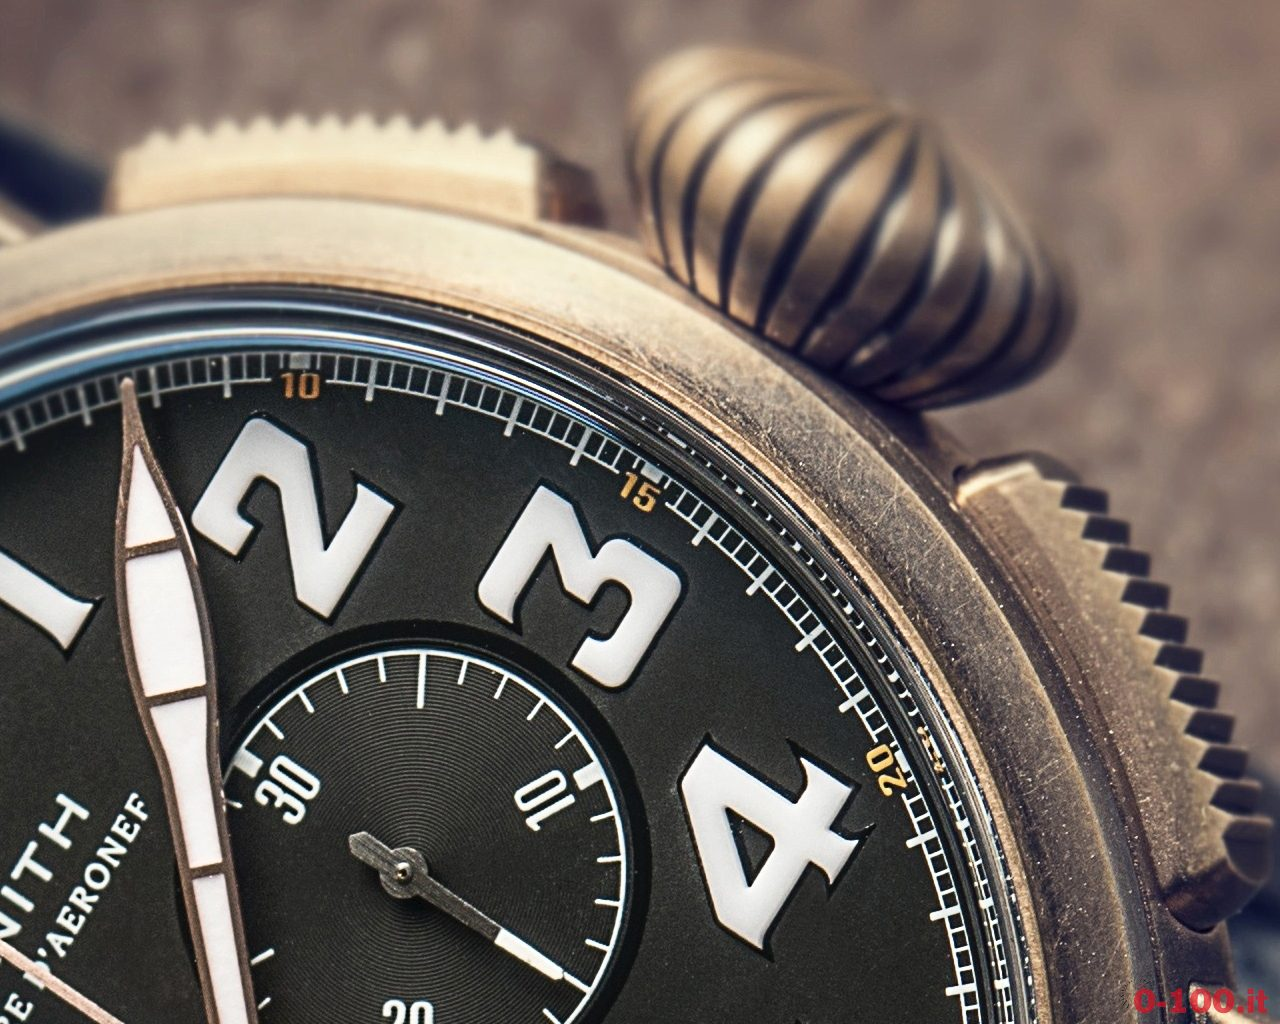 anteprima-baselworld-2017-heritage-collection-zenith-pilot-extra-special-chronograph-ref-9-2430-4069-21-c800-prezzo-price_0-1007